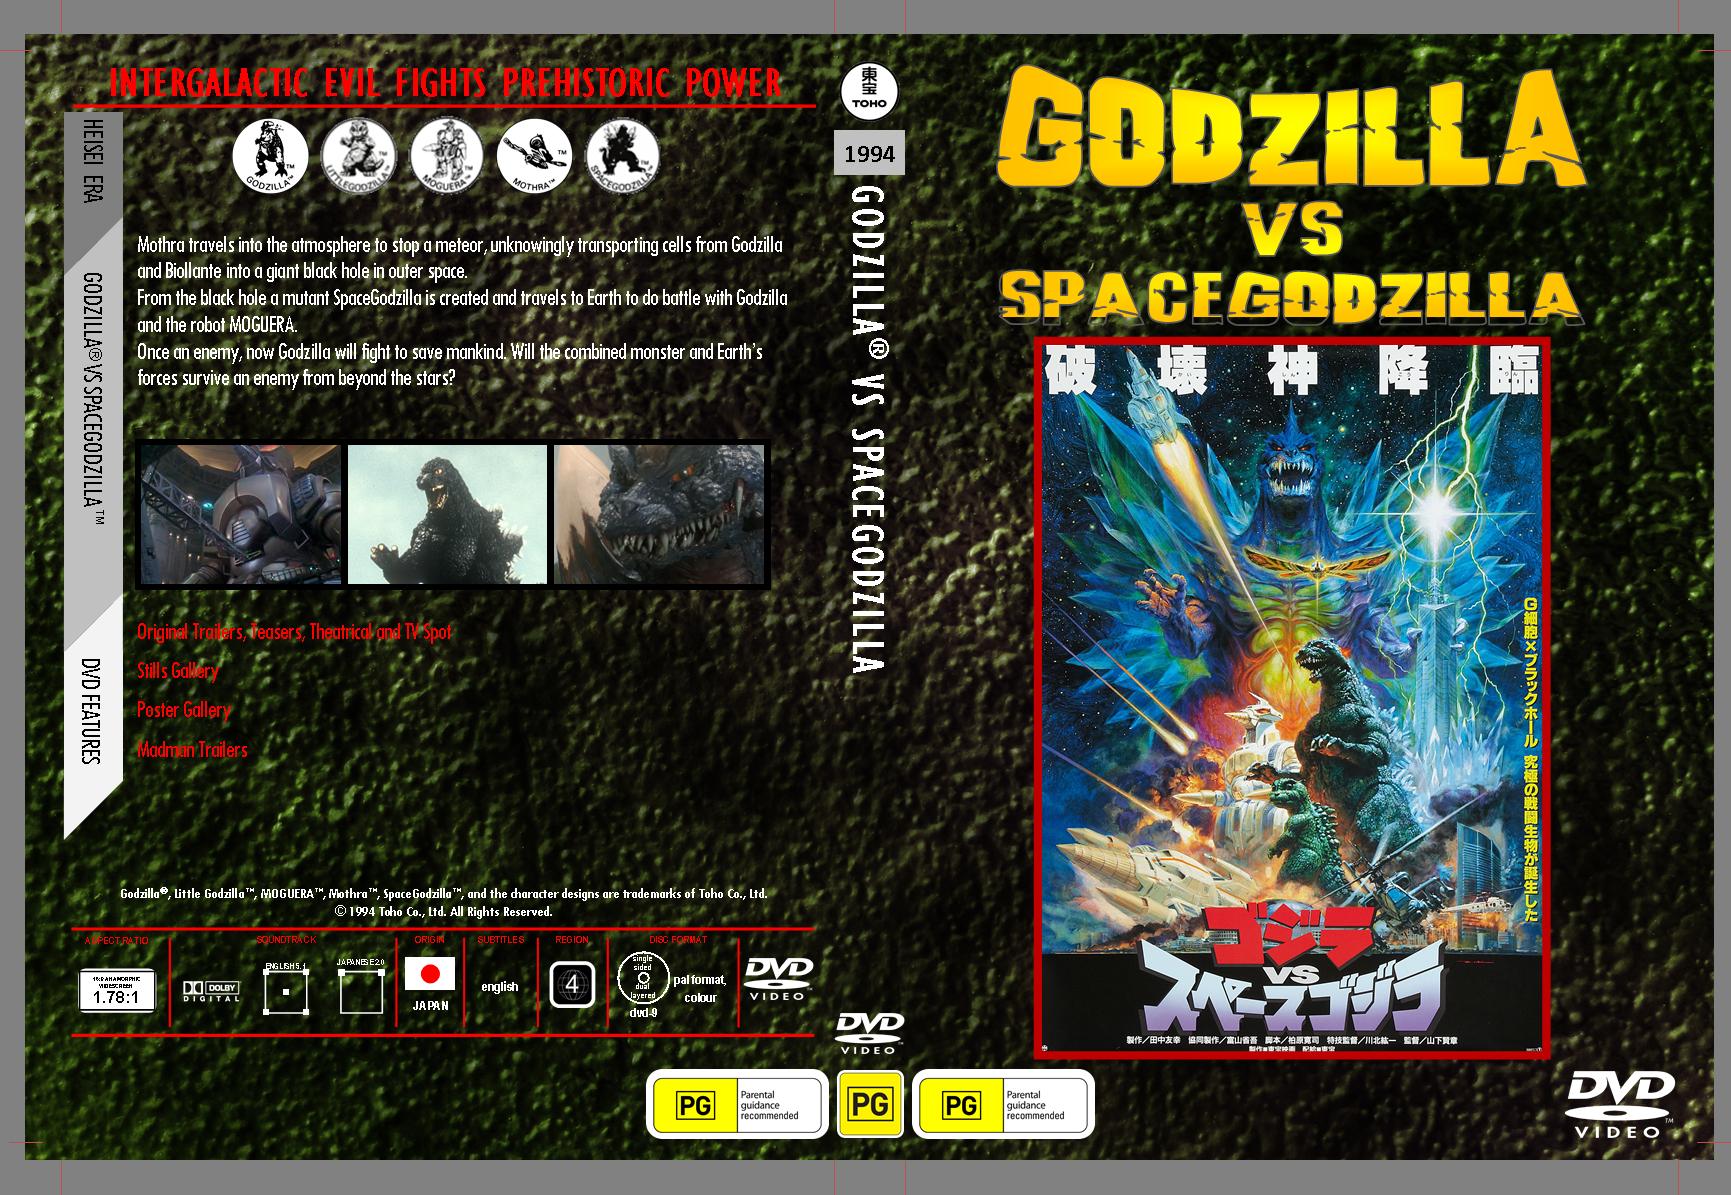 1994 Godzilla vs SpaceGodzilla - PDF by unsungno1 on ...